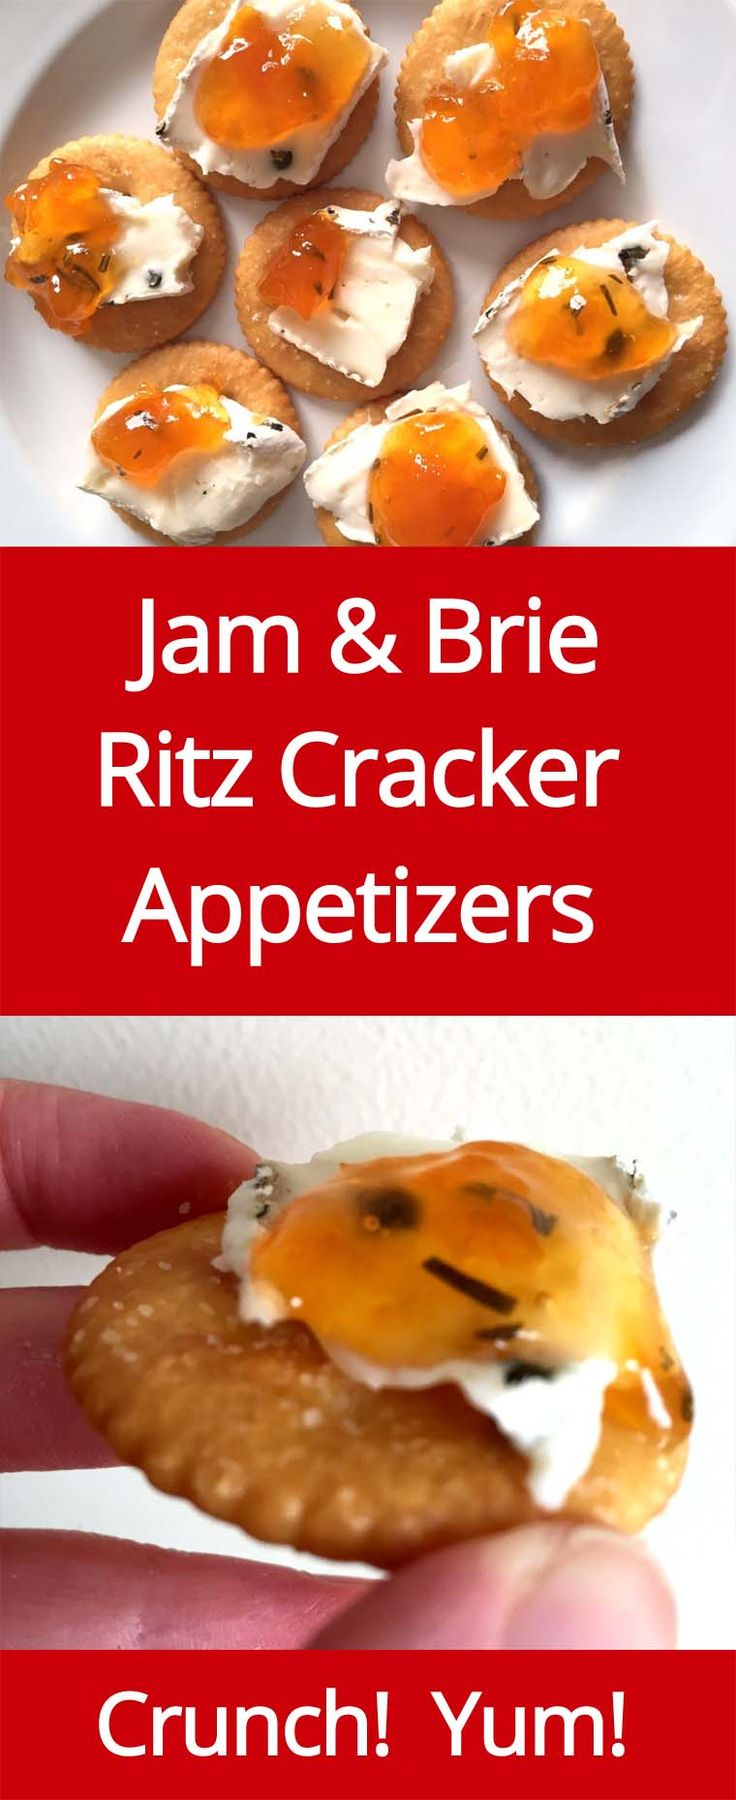 Jam & Brie Cheese On Ritz Crackers - Amazing Easy Appetizer!   MelanieCooks.com